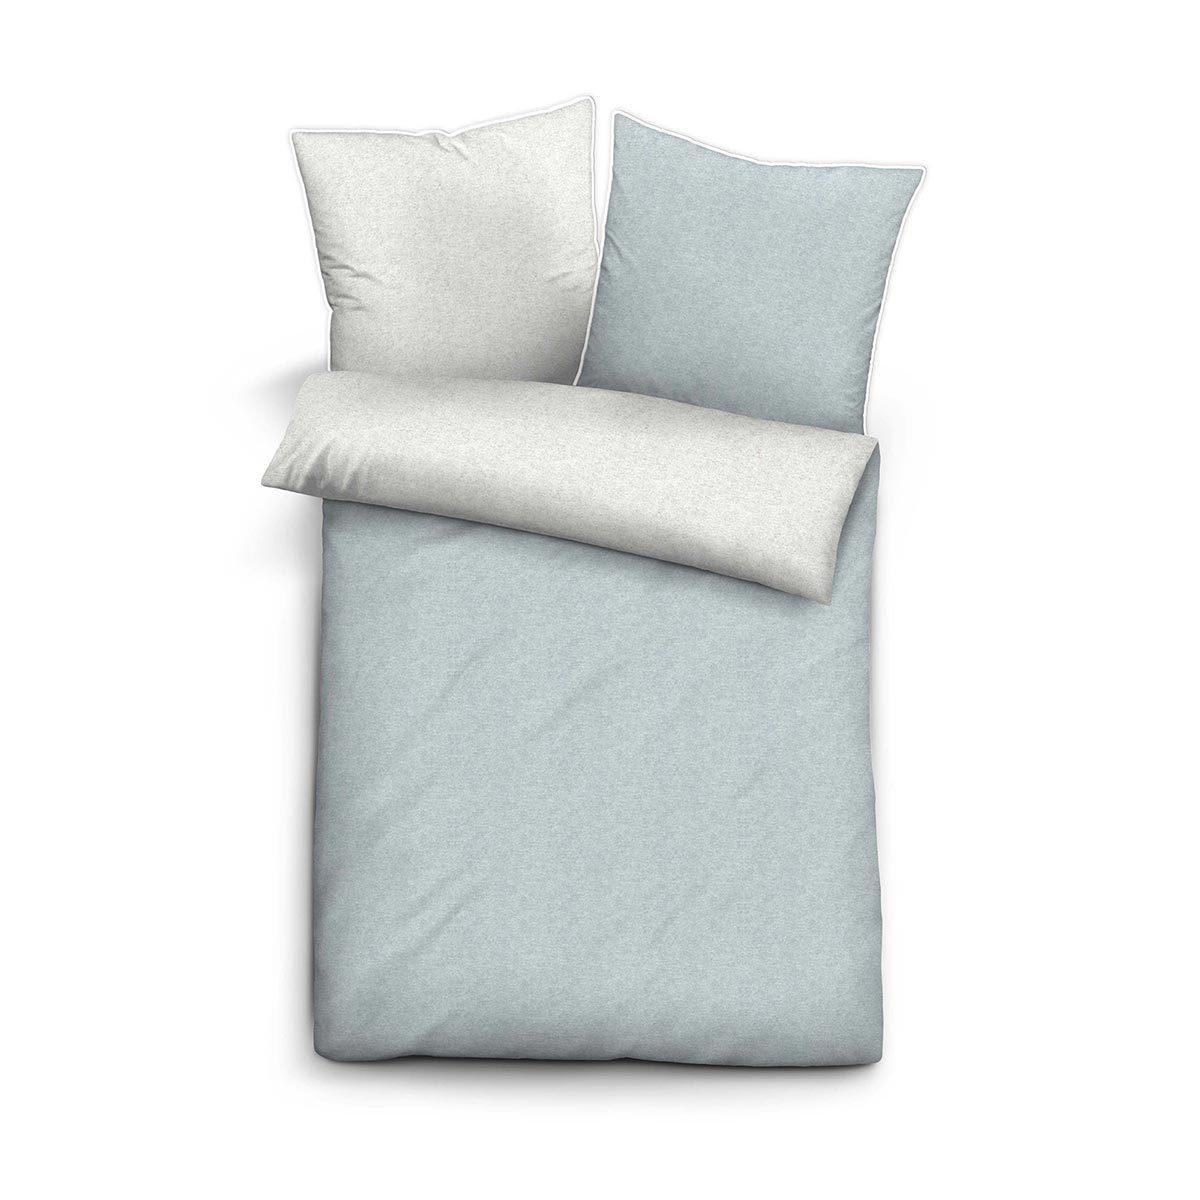 biberna melange flanell bettw sche 840500 222 g nstig online kaufen bei bettwaren shop. Black Bedroom Furniture Sets. Home Design Ideas